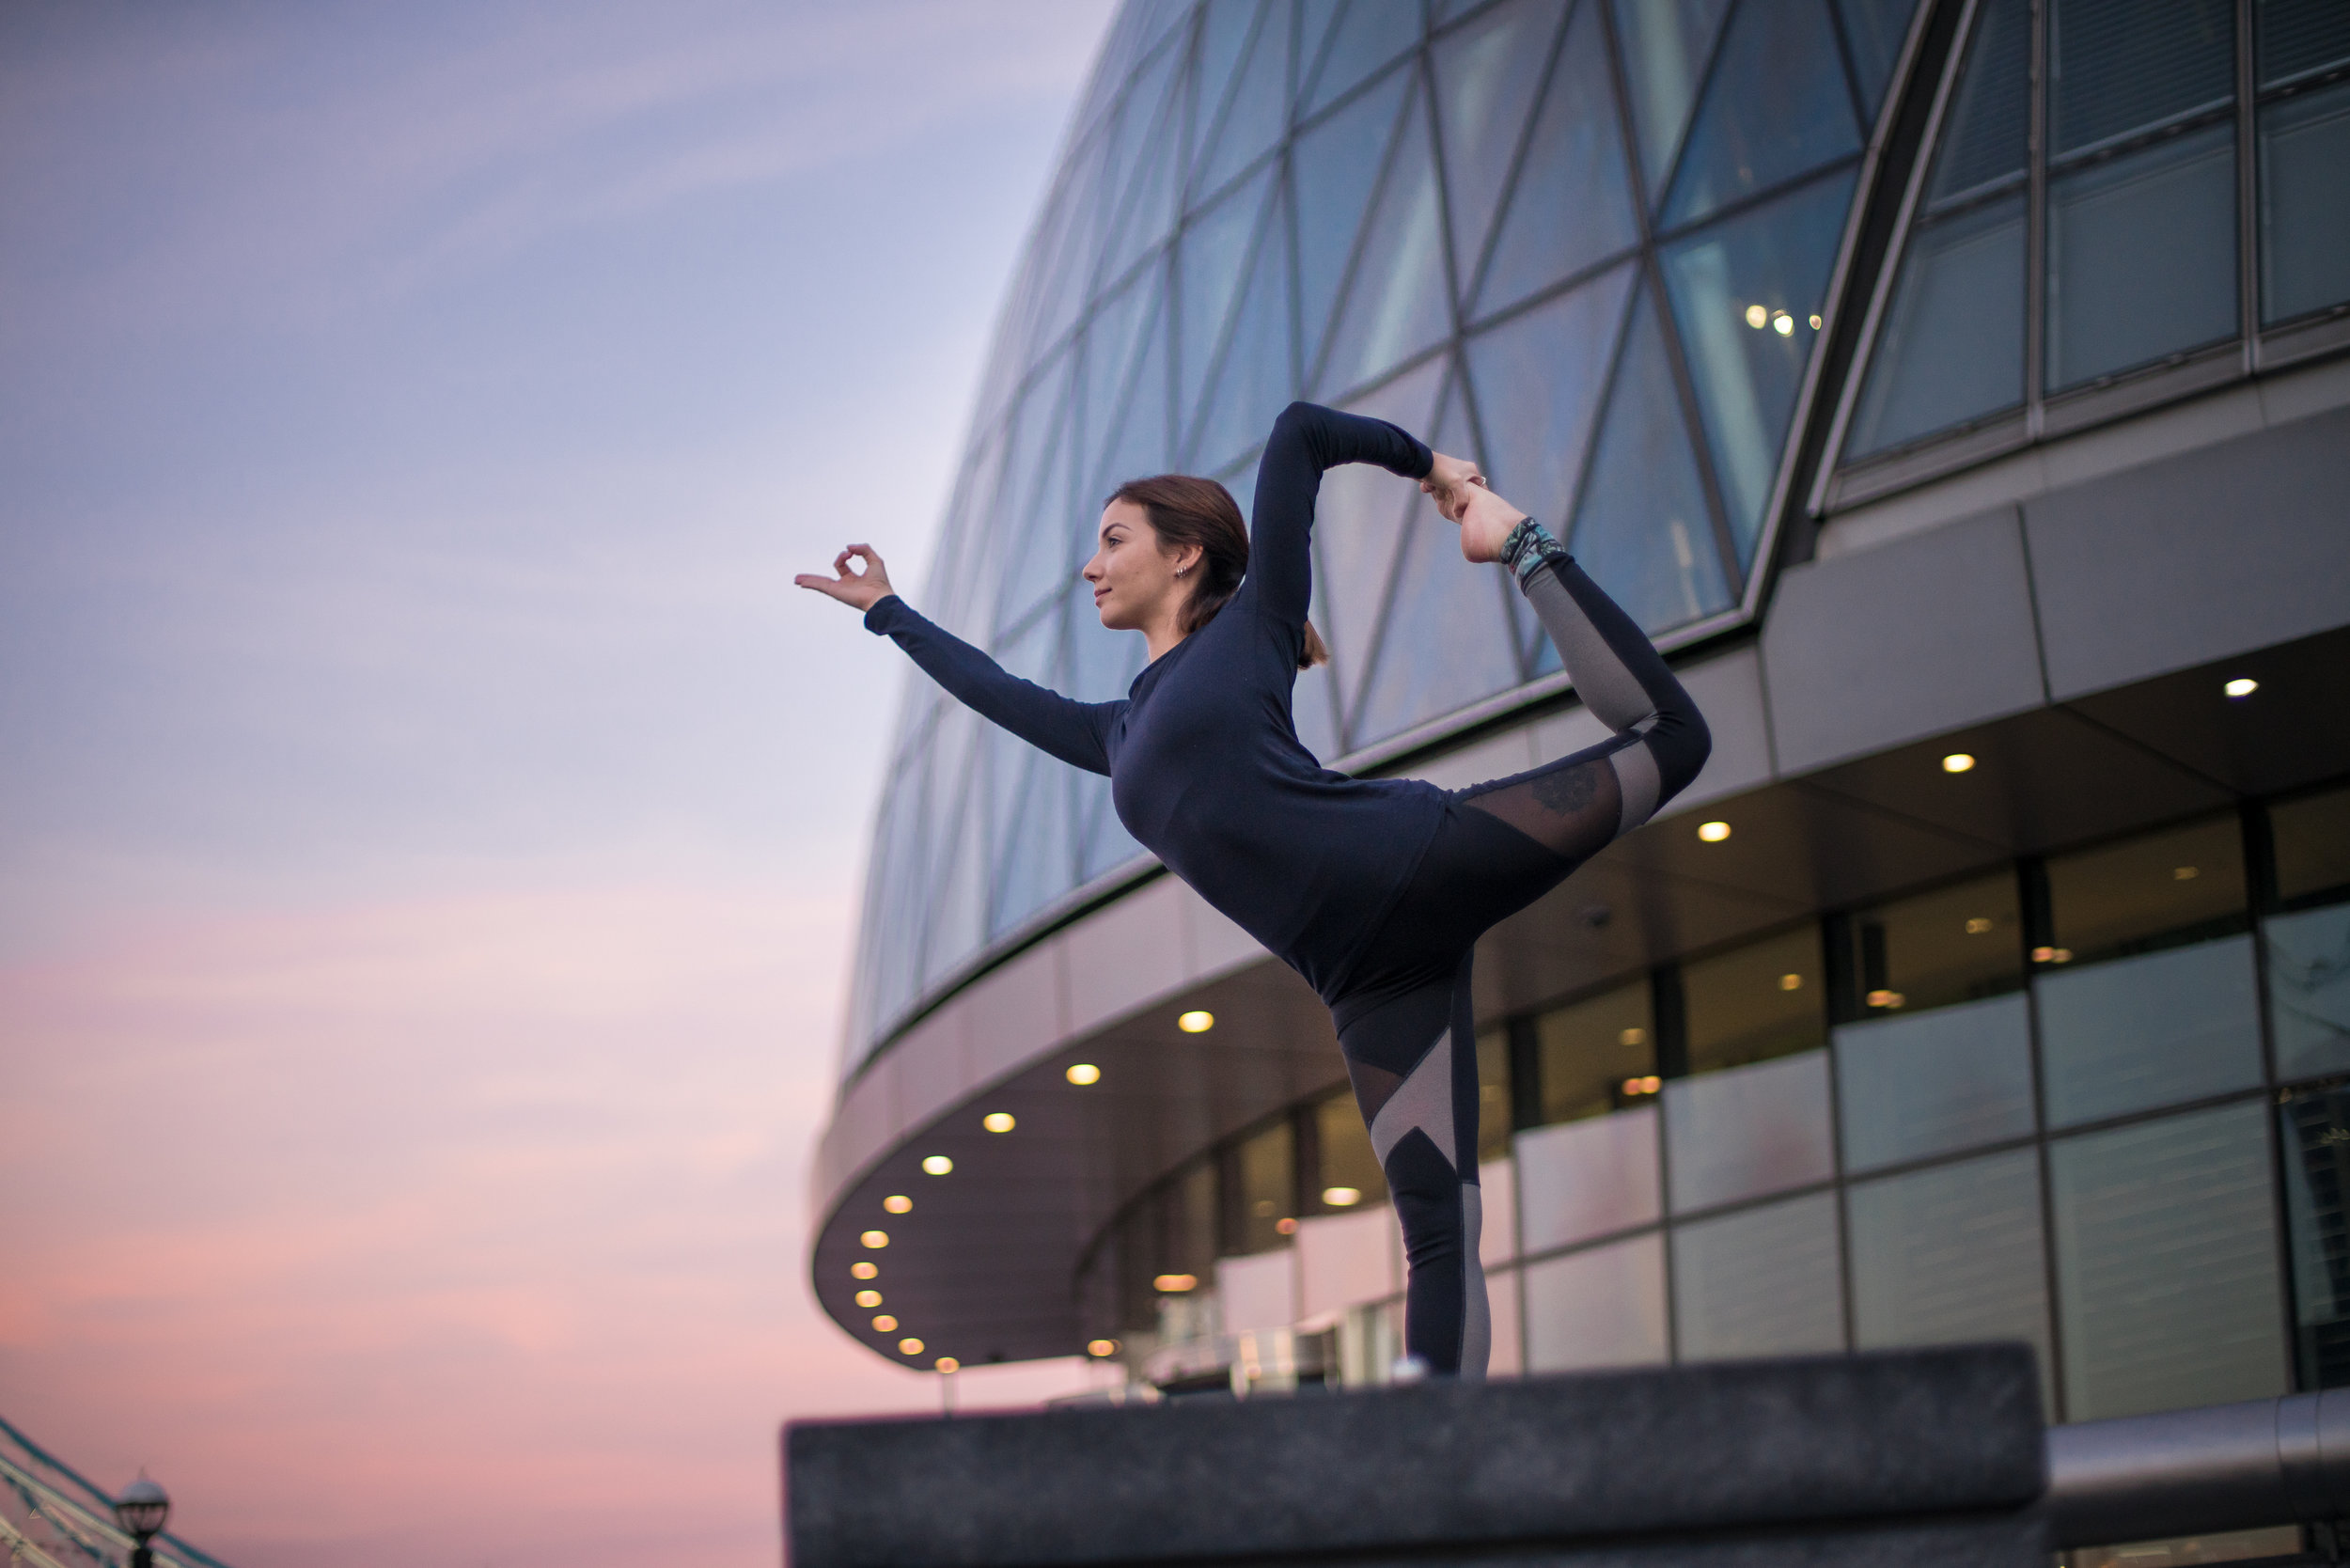 MoreYoga_International Yoga Day_Iva Emilova_City Hall_Credit Maria Nakhmanovich Content Crib.jpg